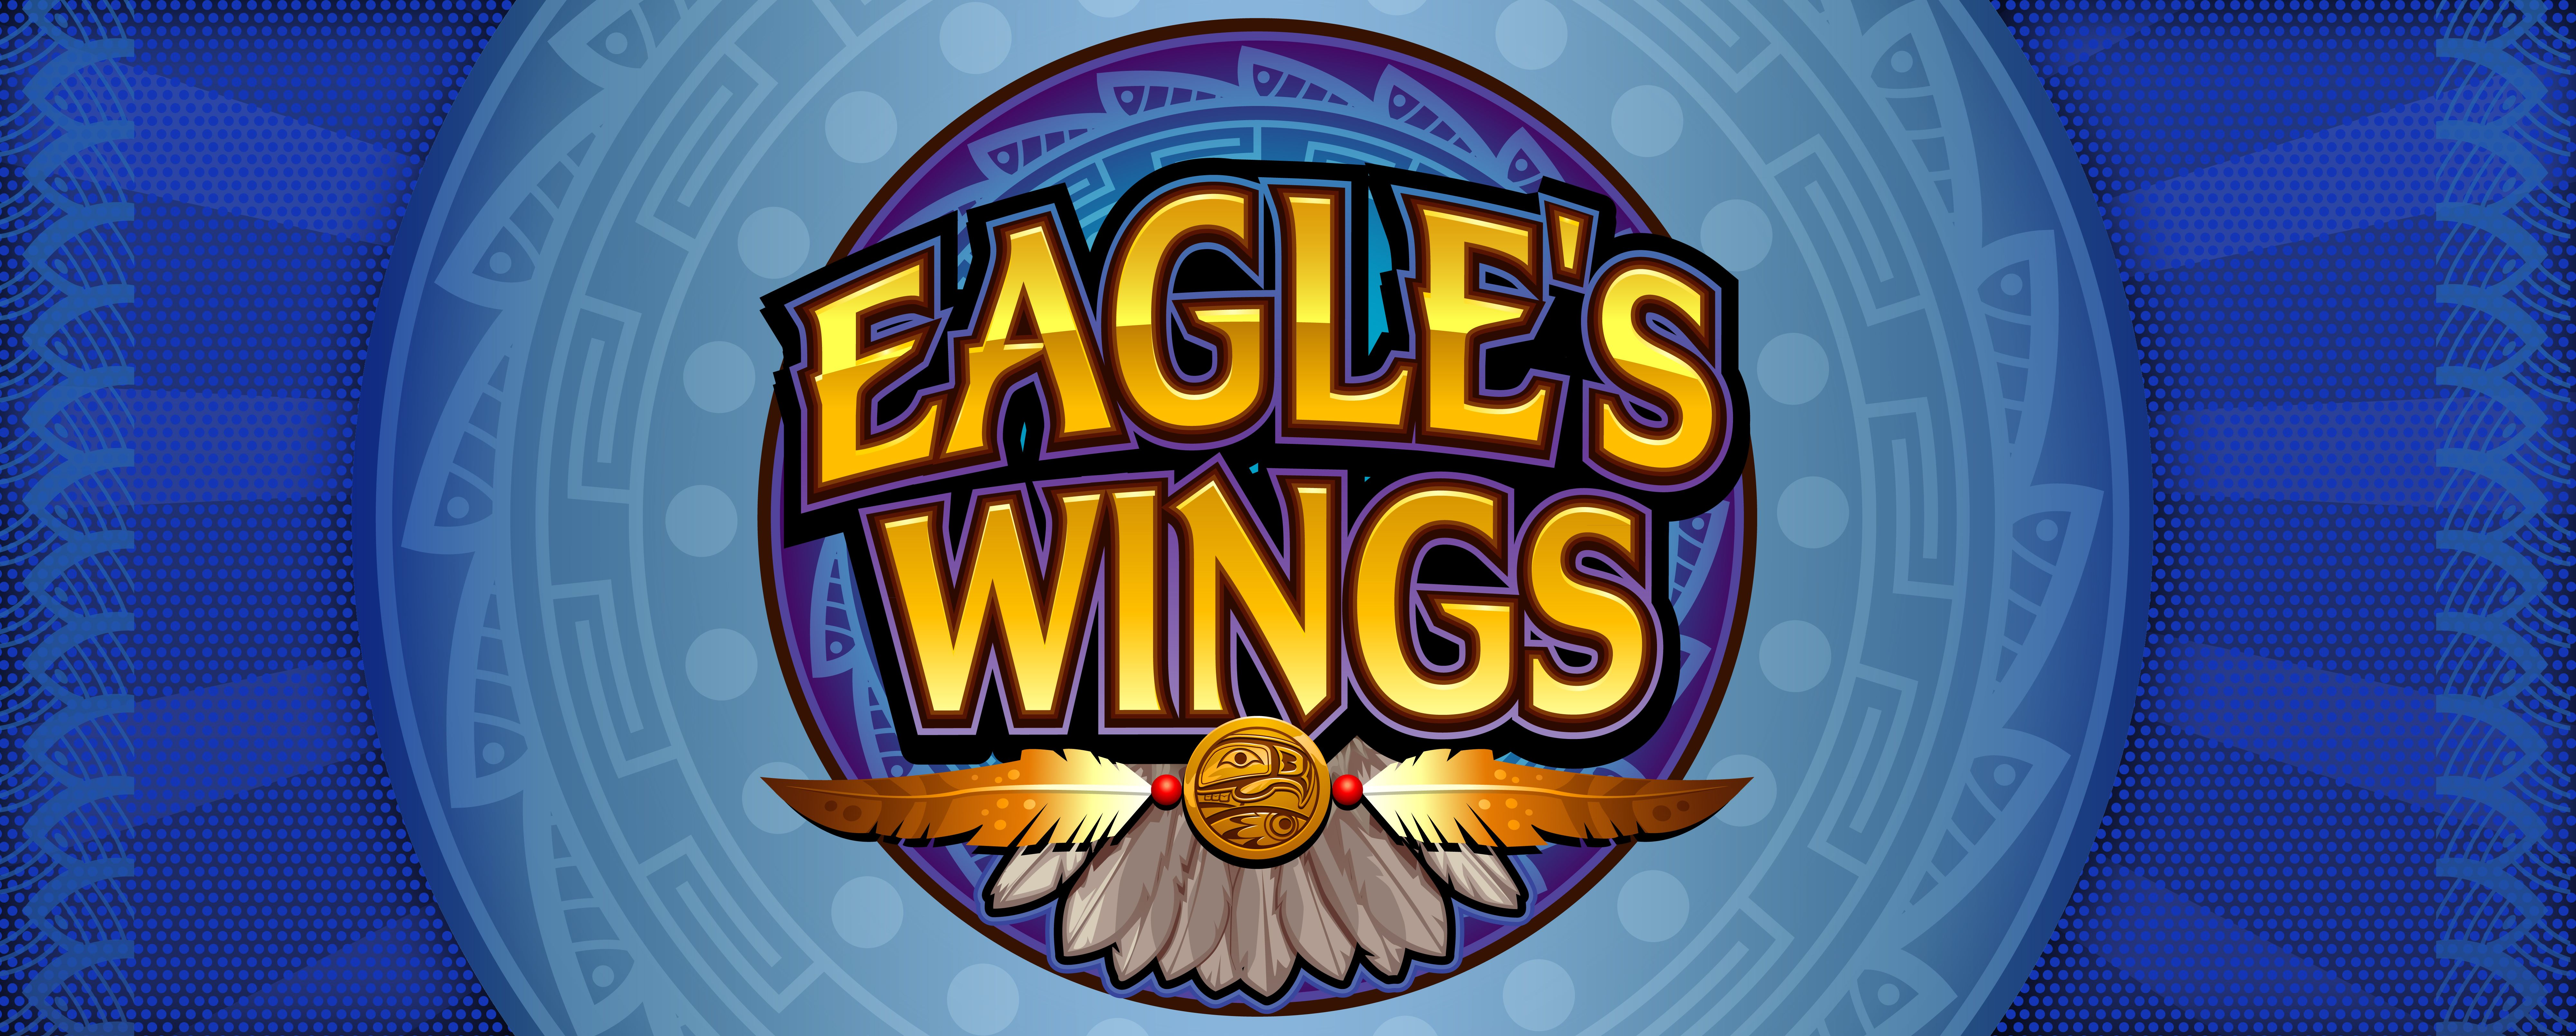 Eagle'S Wings Slot Machine